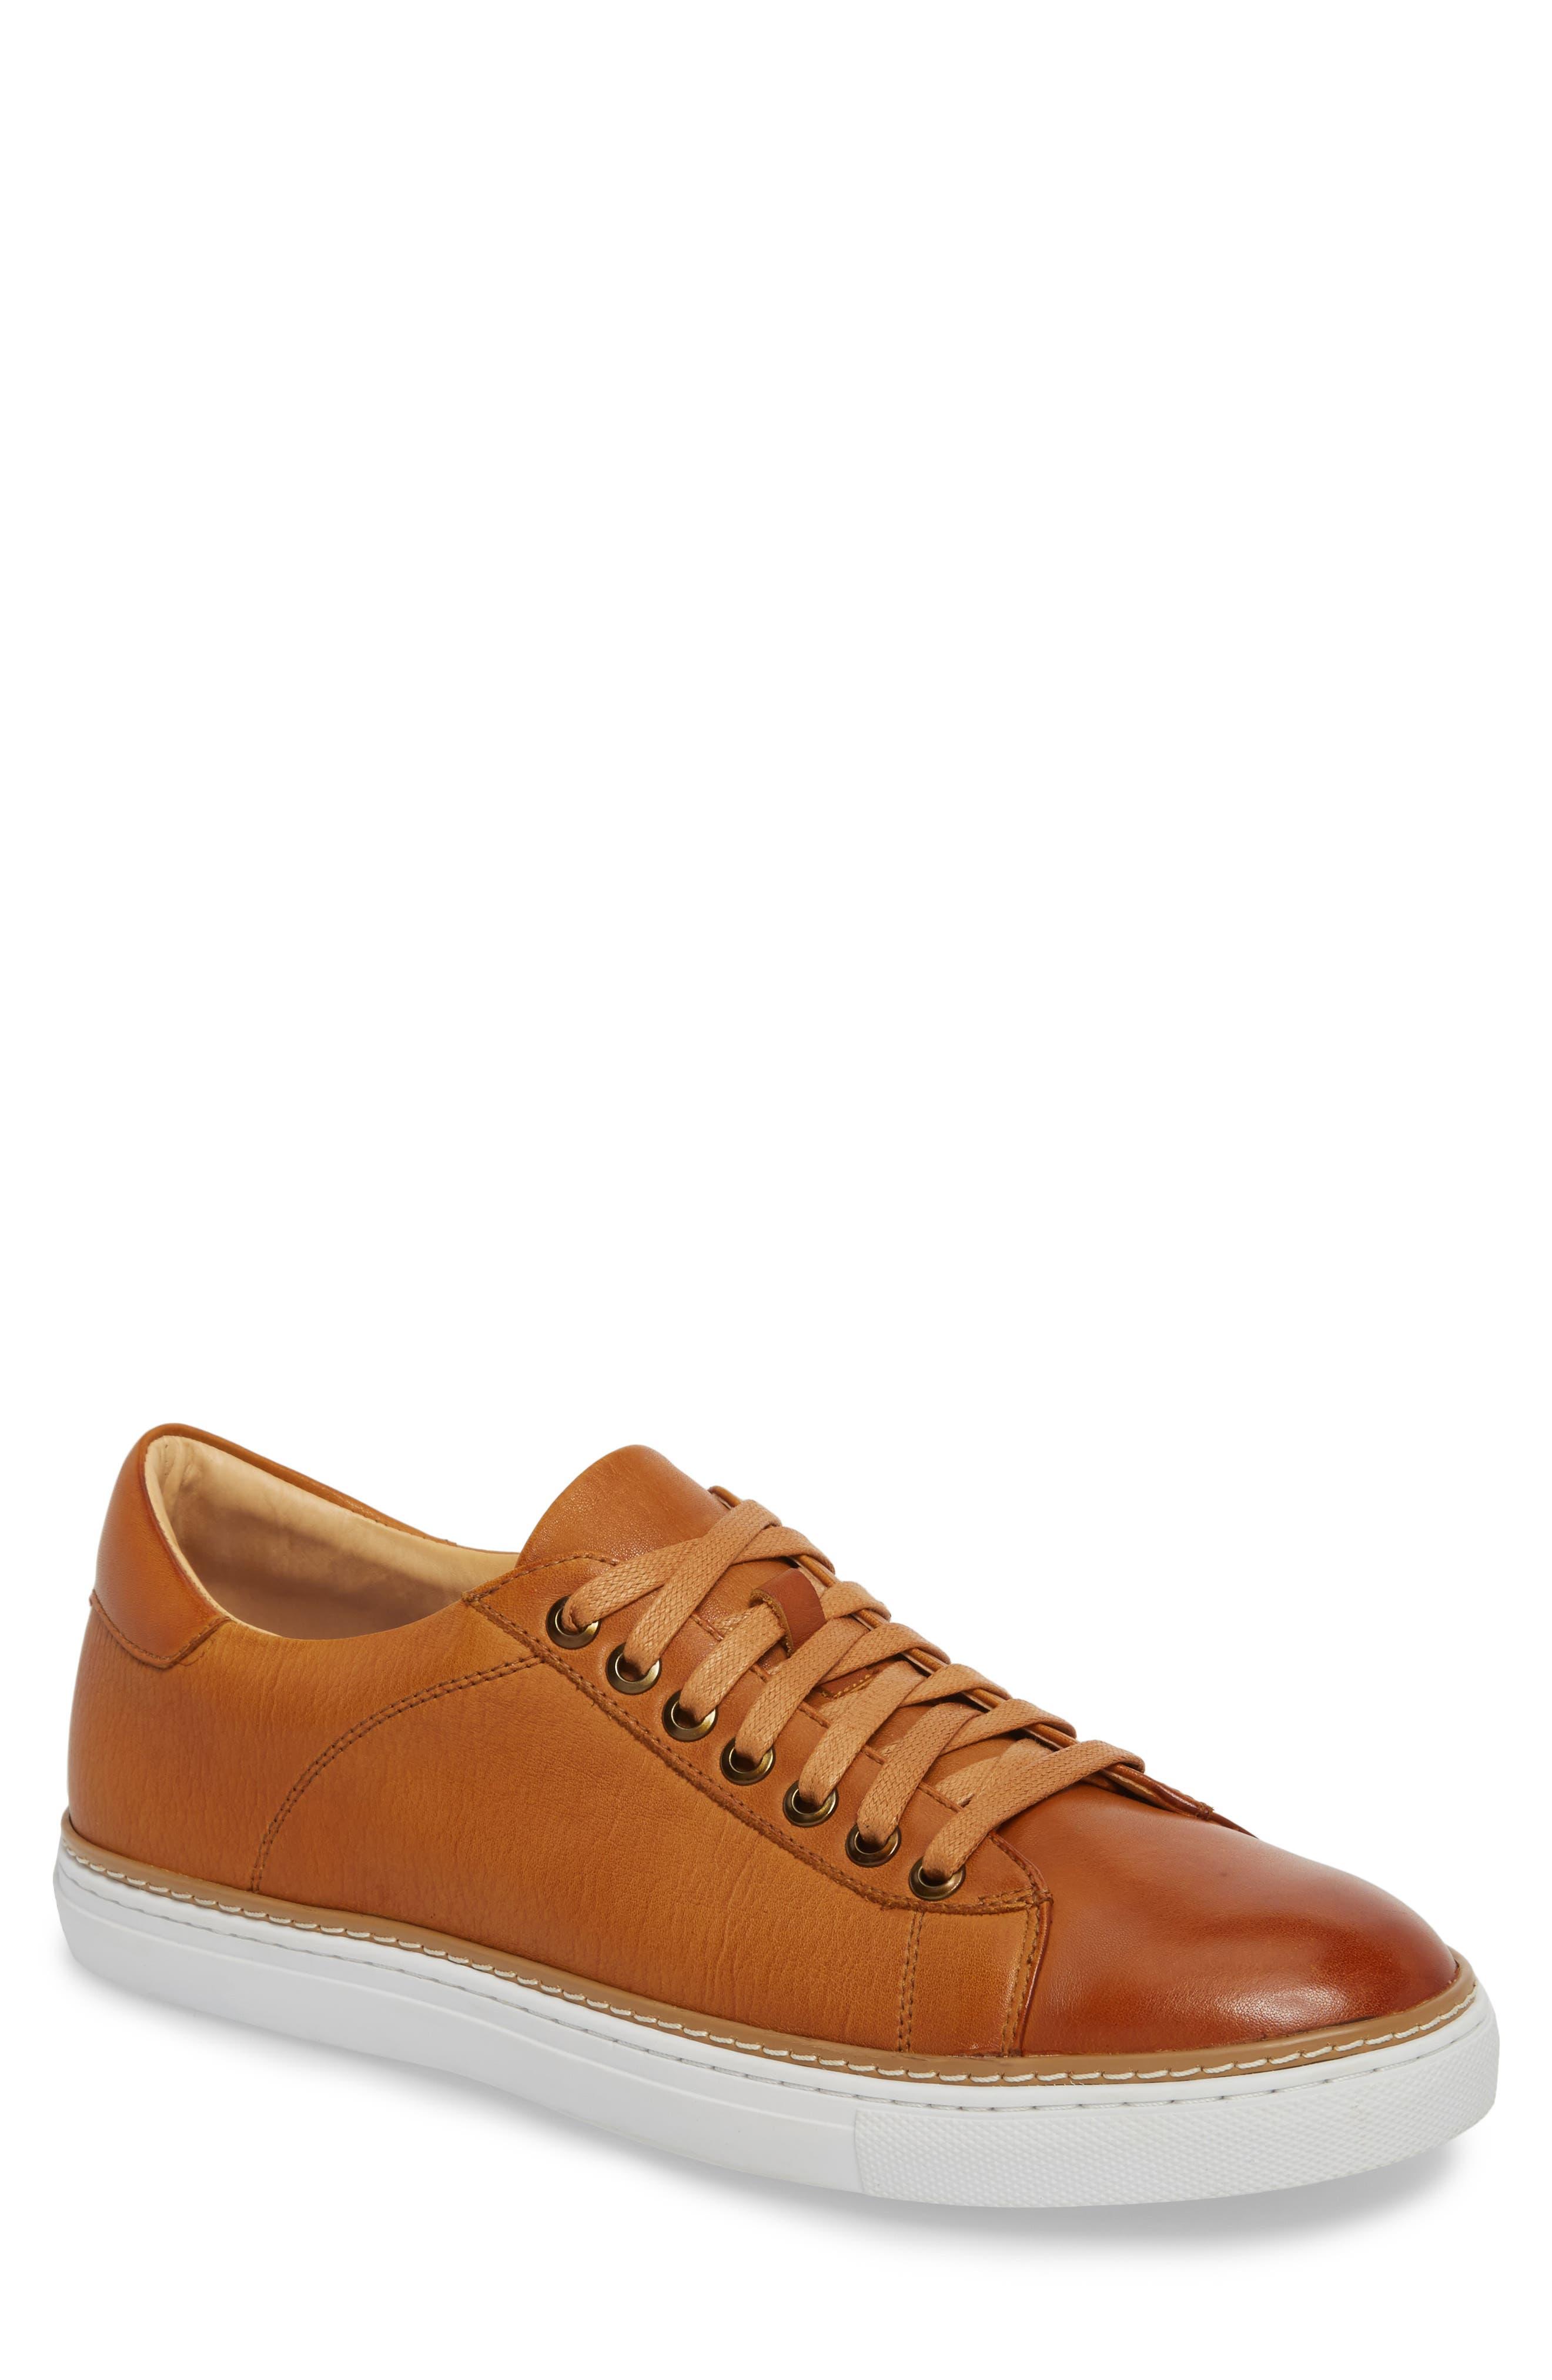 English Laundry Men's Juniper Low Top Sneaker u9W6Pca5S